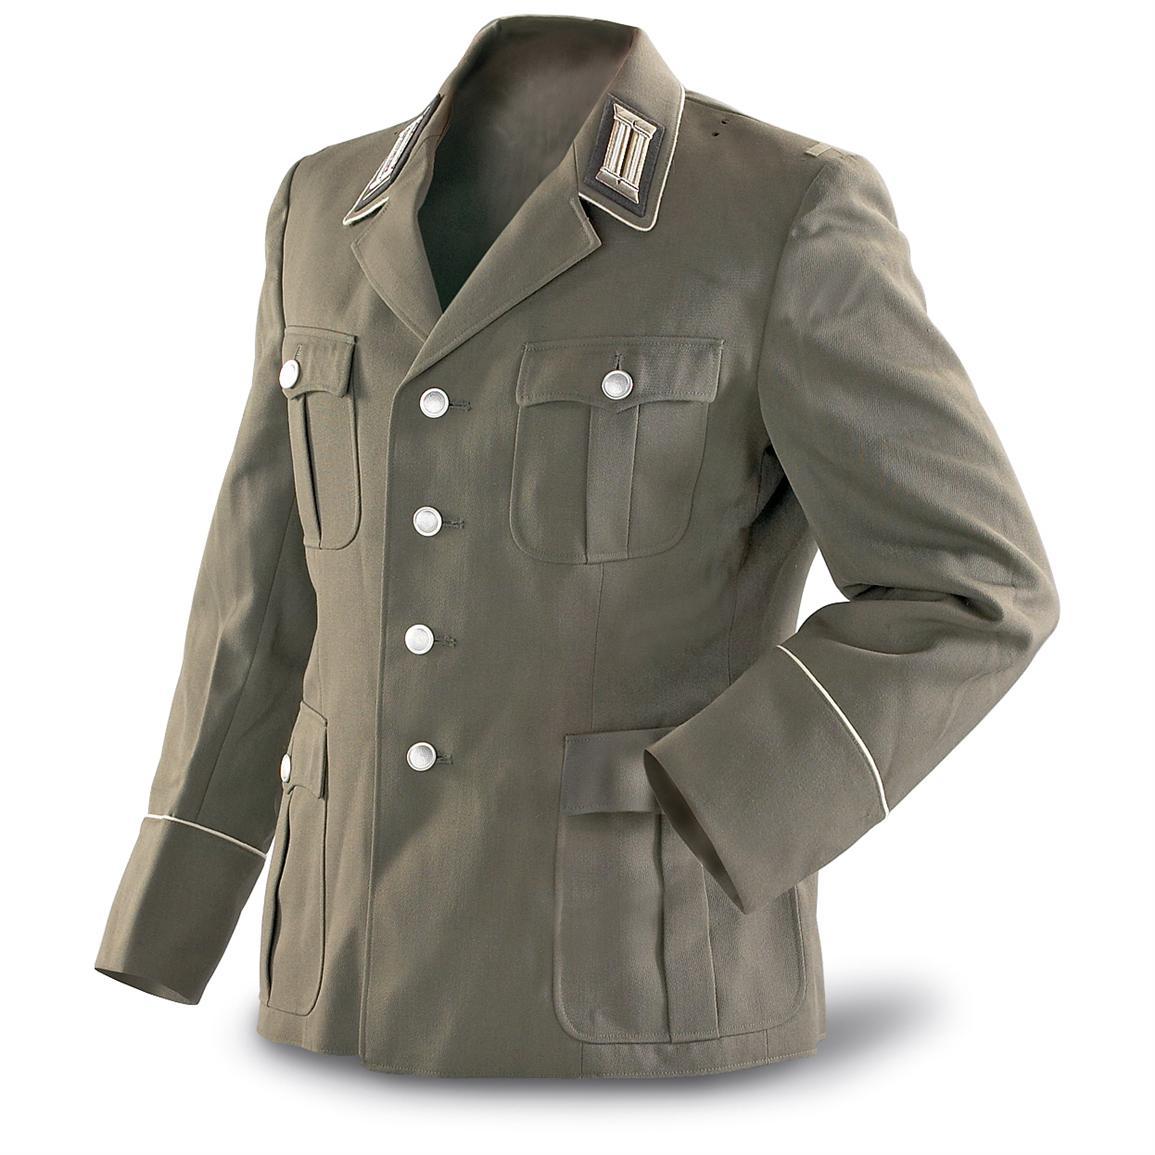 military jacket east german military surplus officeru0027s dress jacket, ... bxcbain